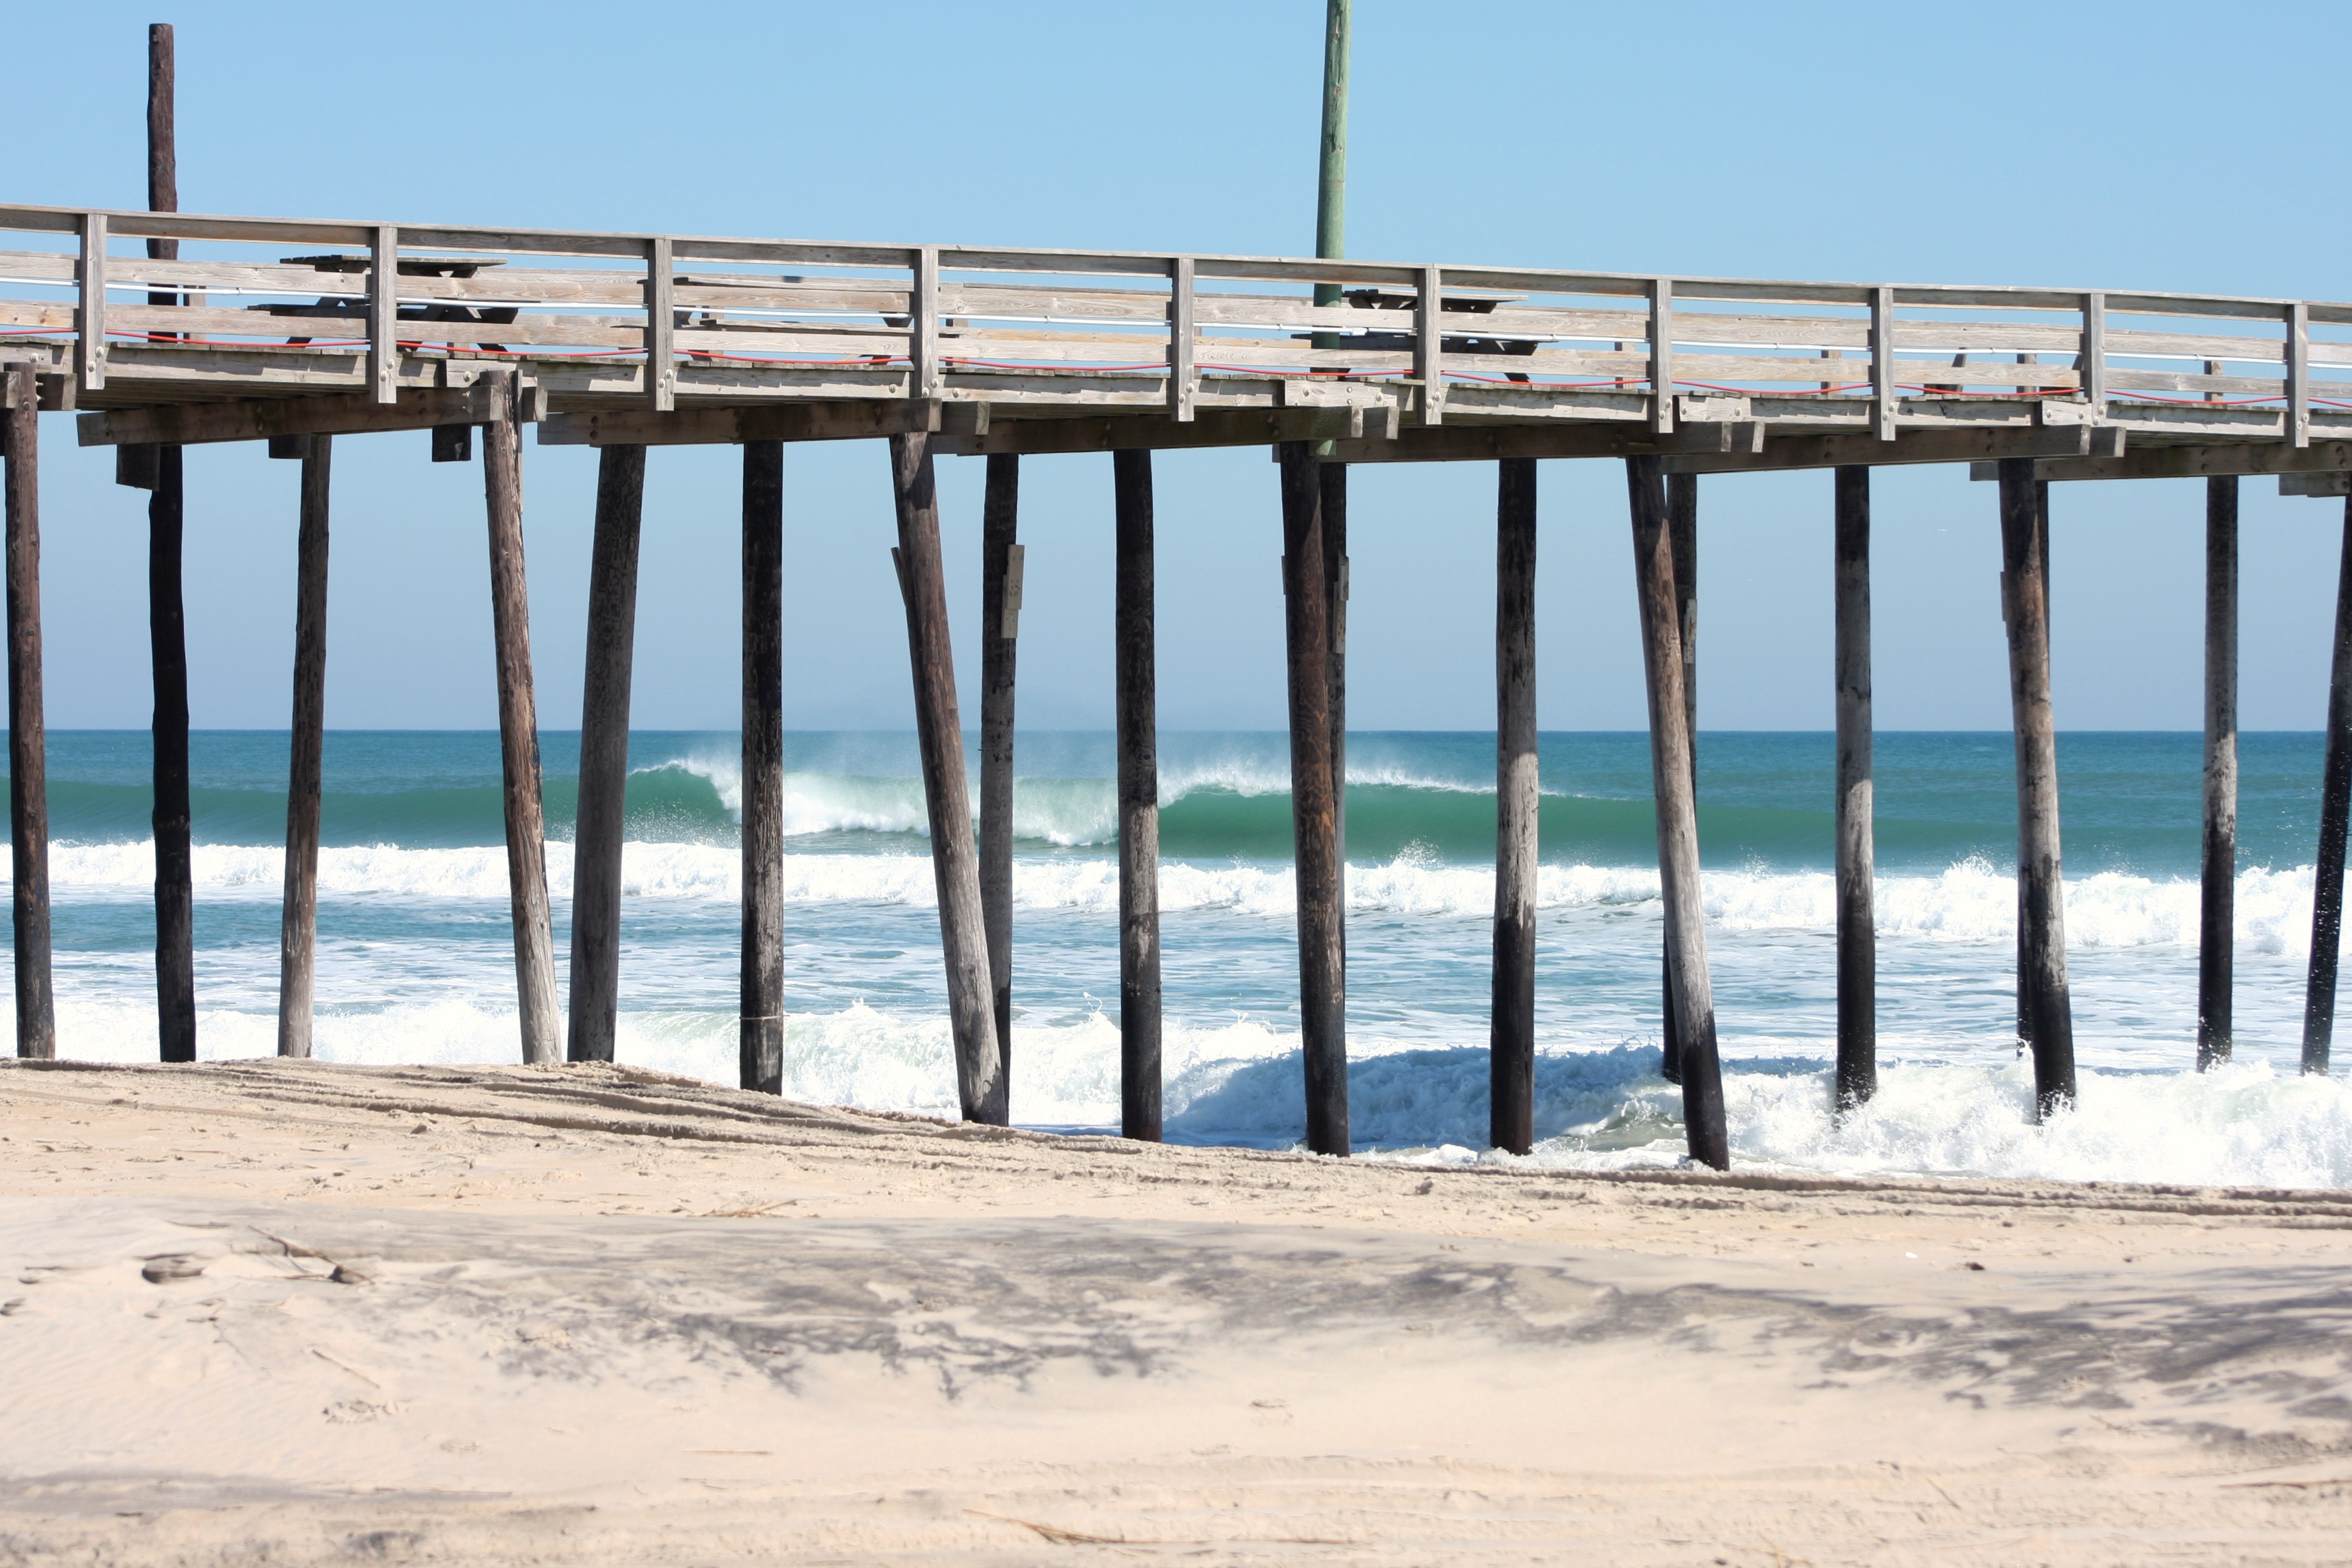 surfline launches new hd surf cam at avon pier